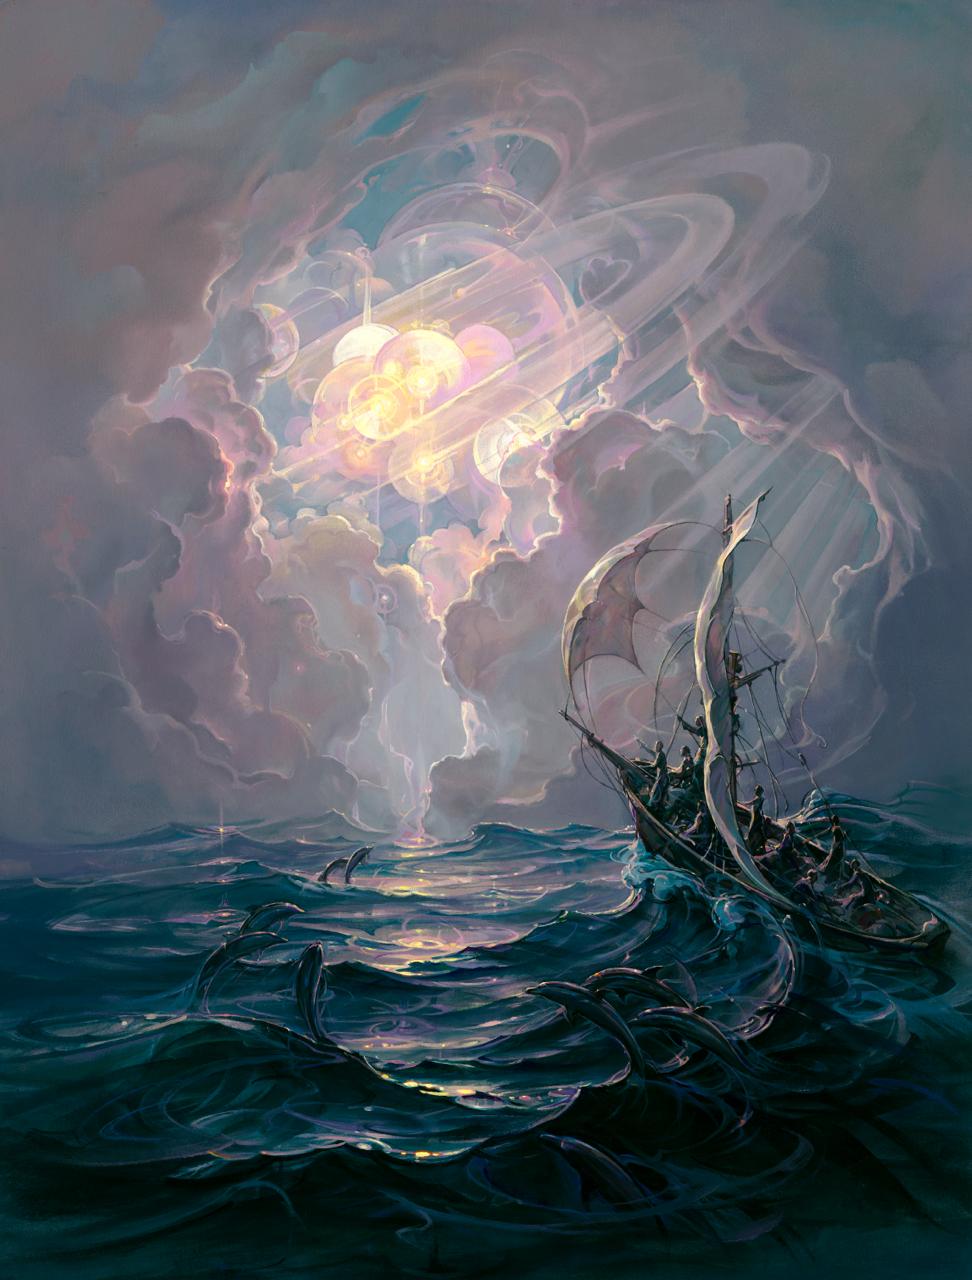 Voyage of Man  by John Pitre